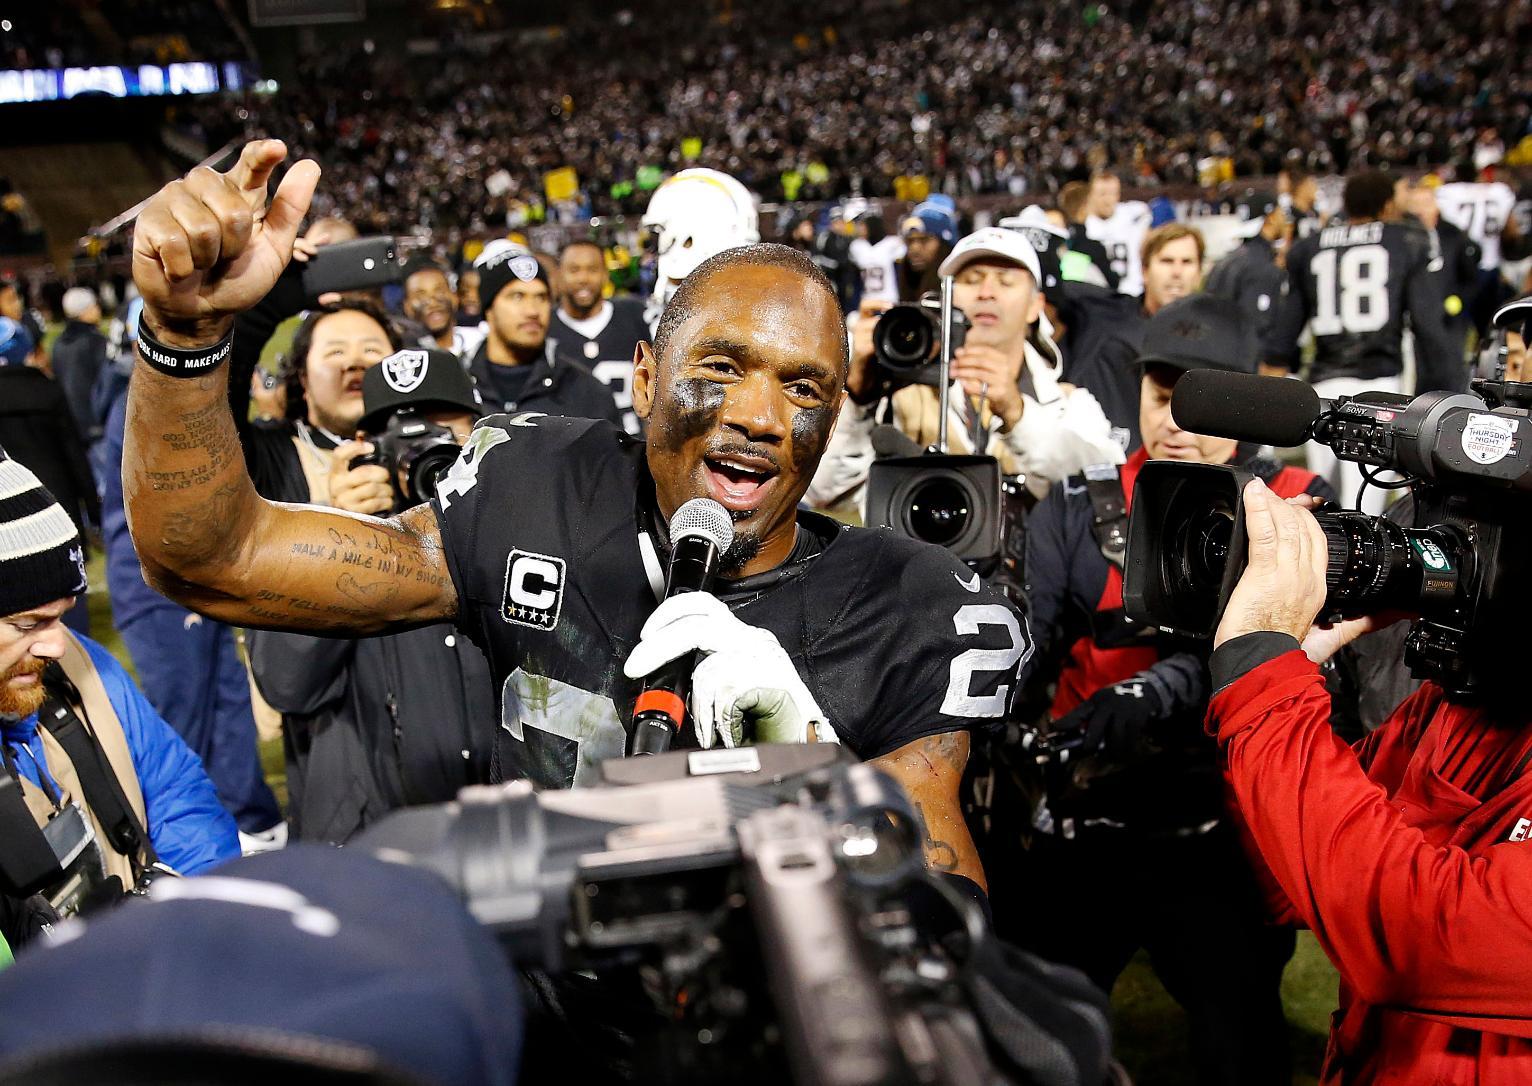 [NFL] Week 16: Una vittoria per Charles Woodson (San Diego Chargers - Oakland Raiders 20-23)